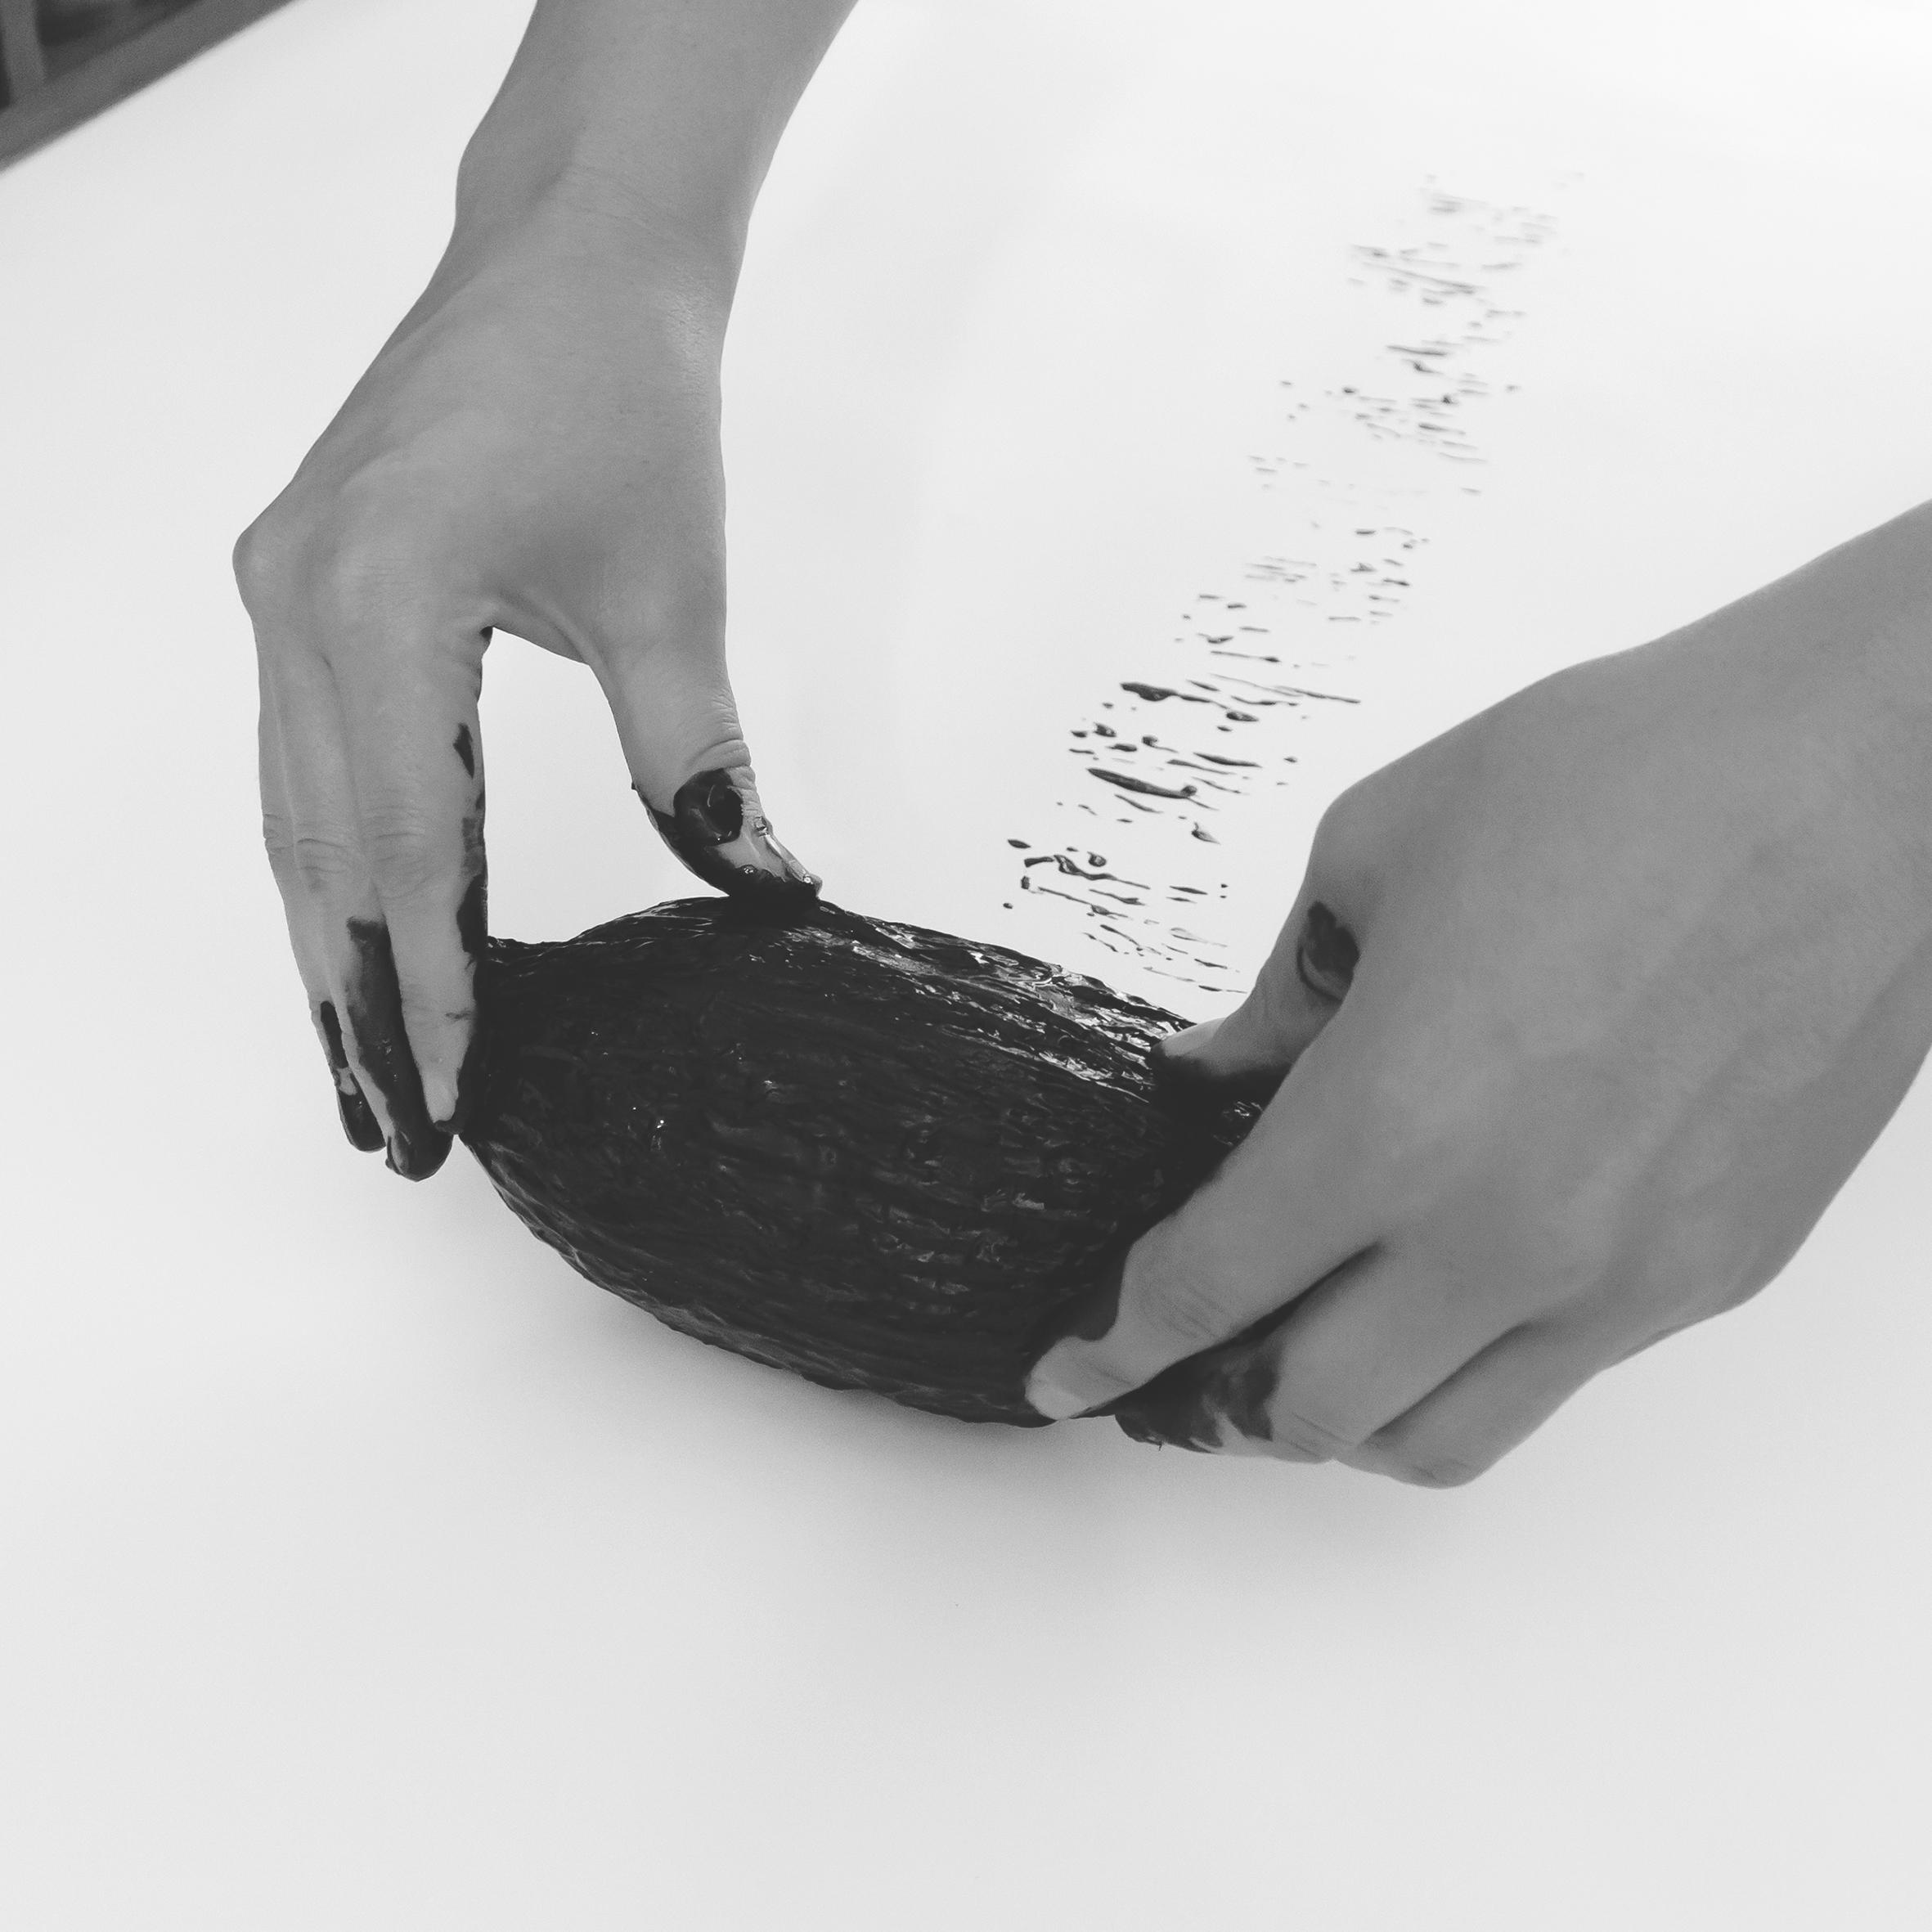 print-making-bts-04.jpg